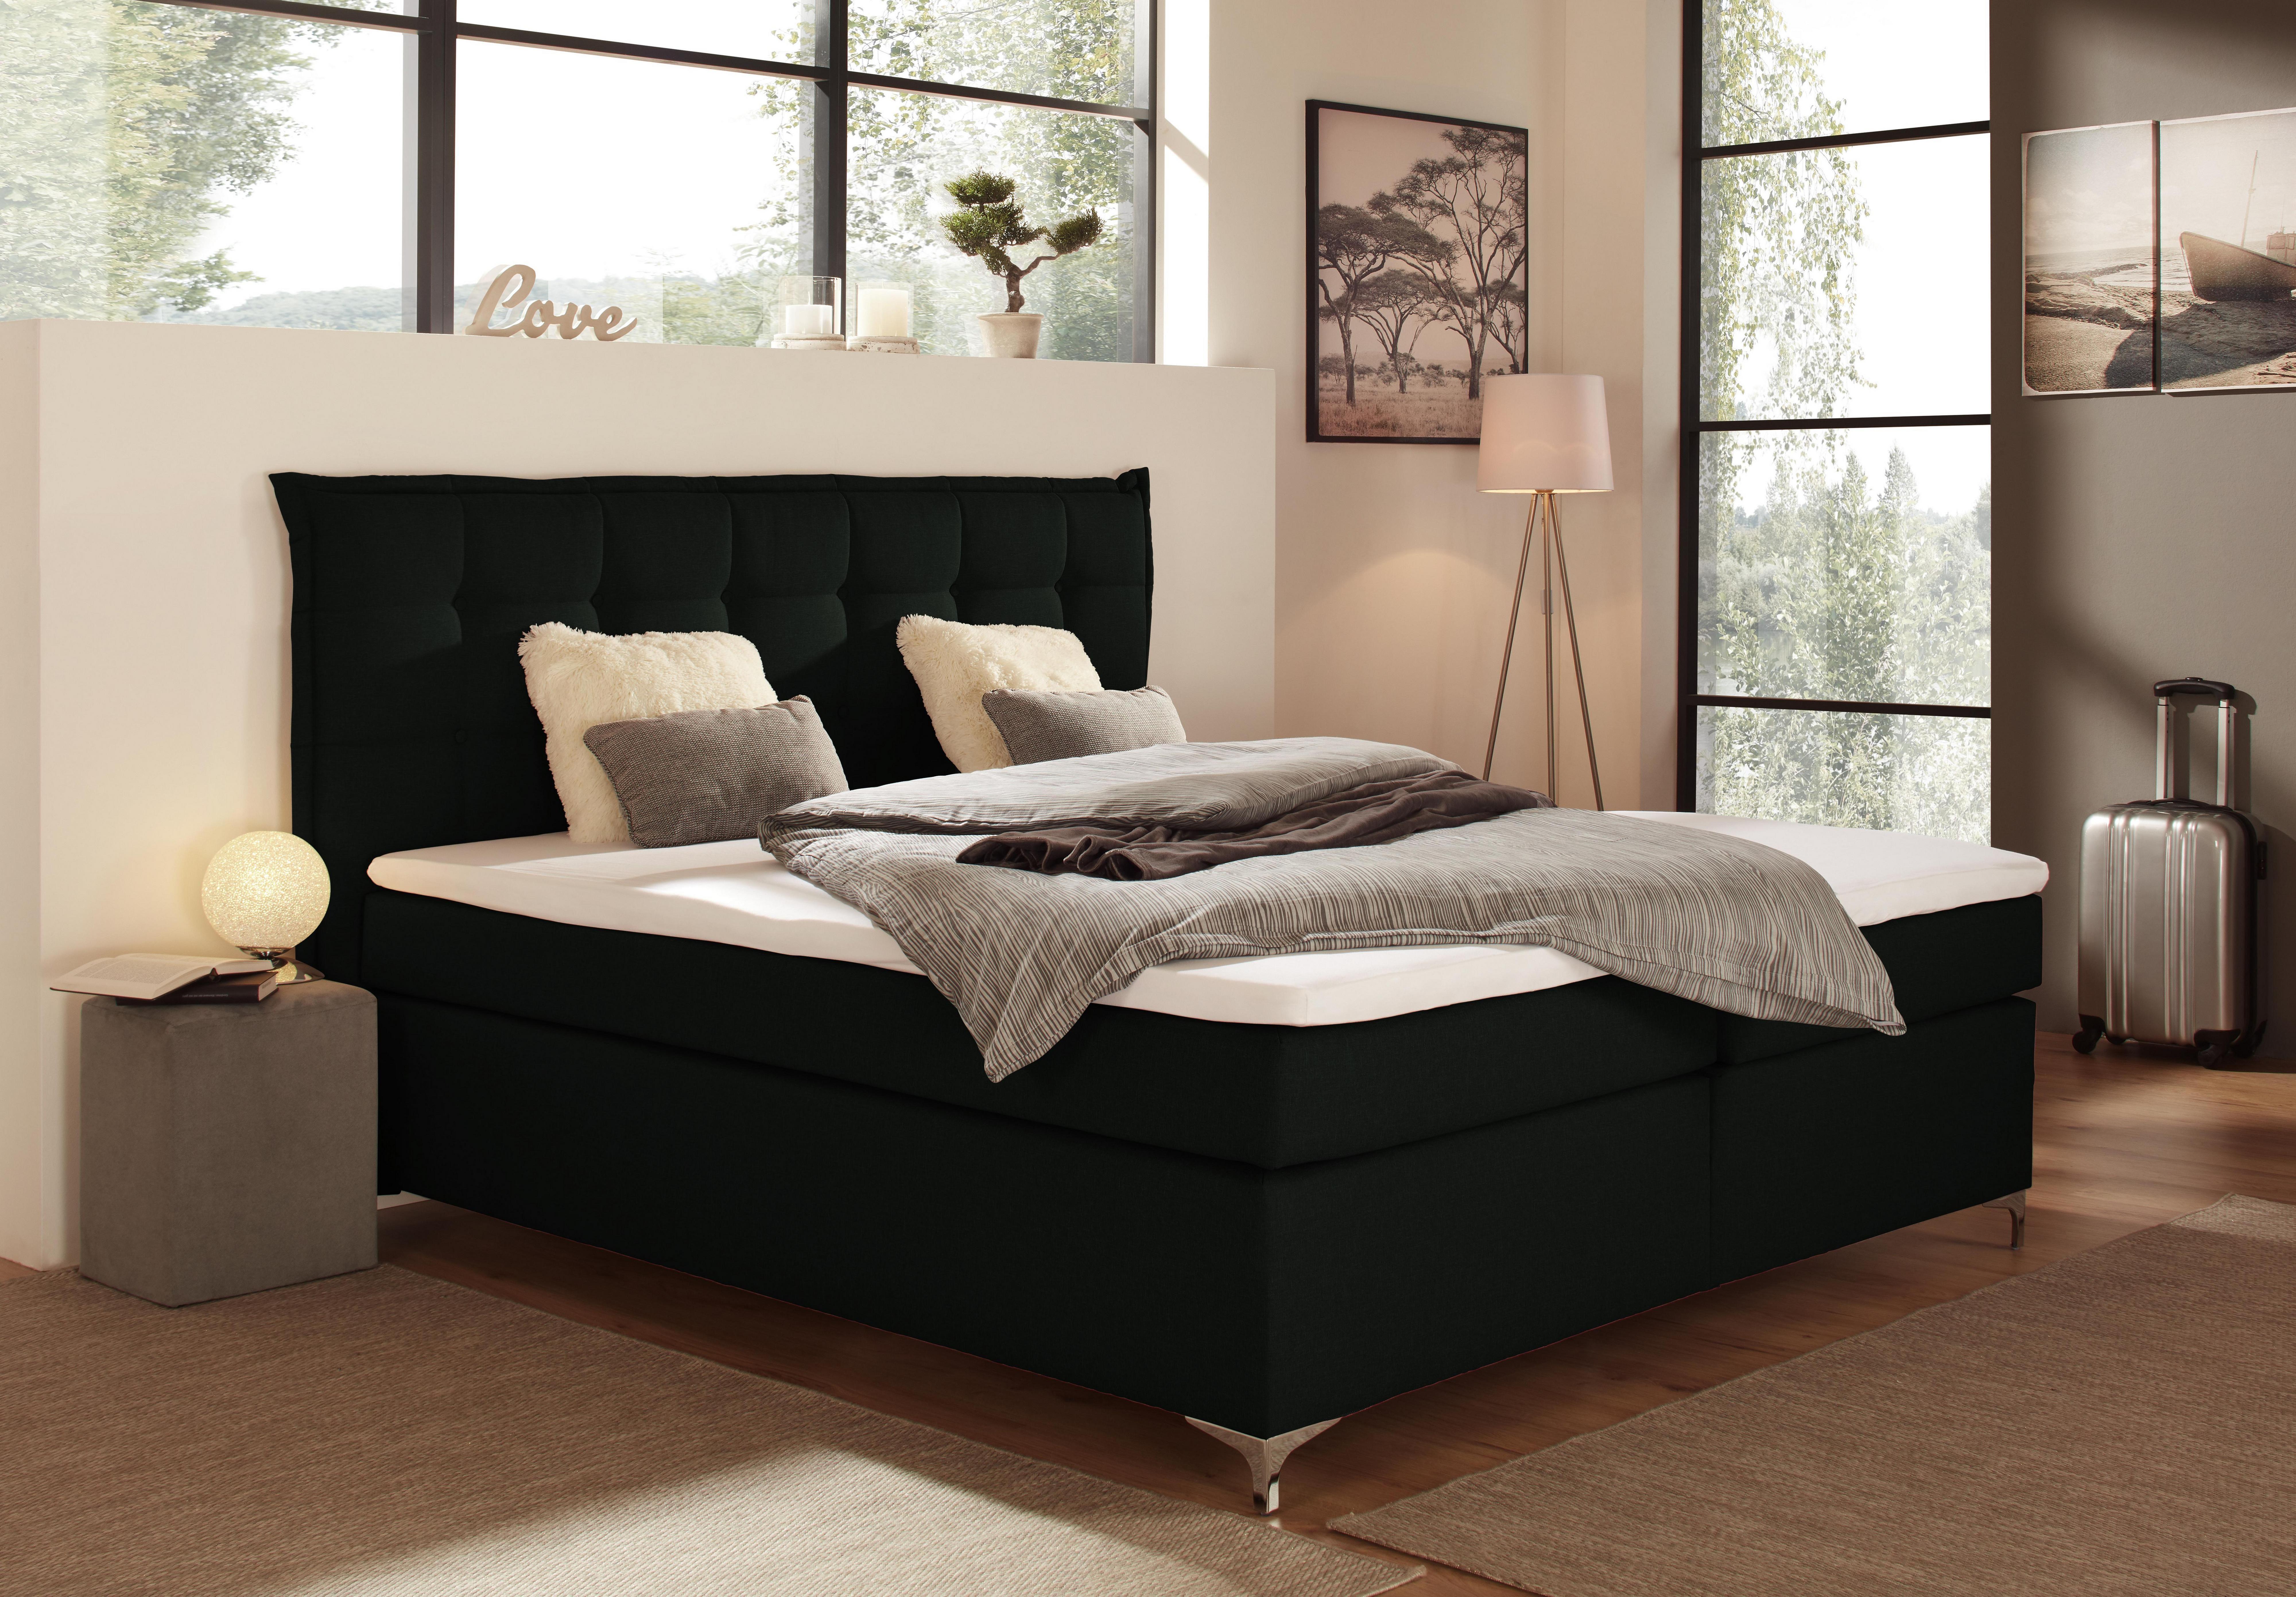 Schlafzimmer Bett Mobelix Home Design In 2019 Pinterest House